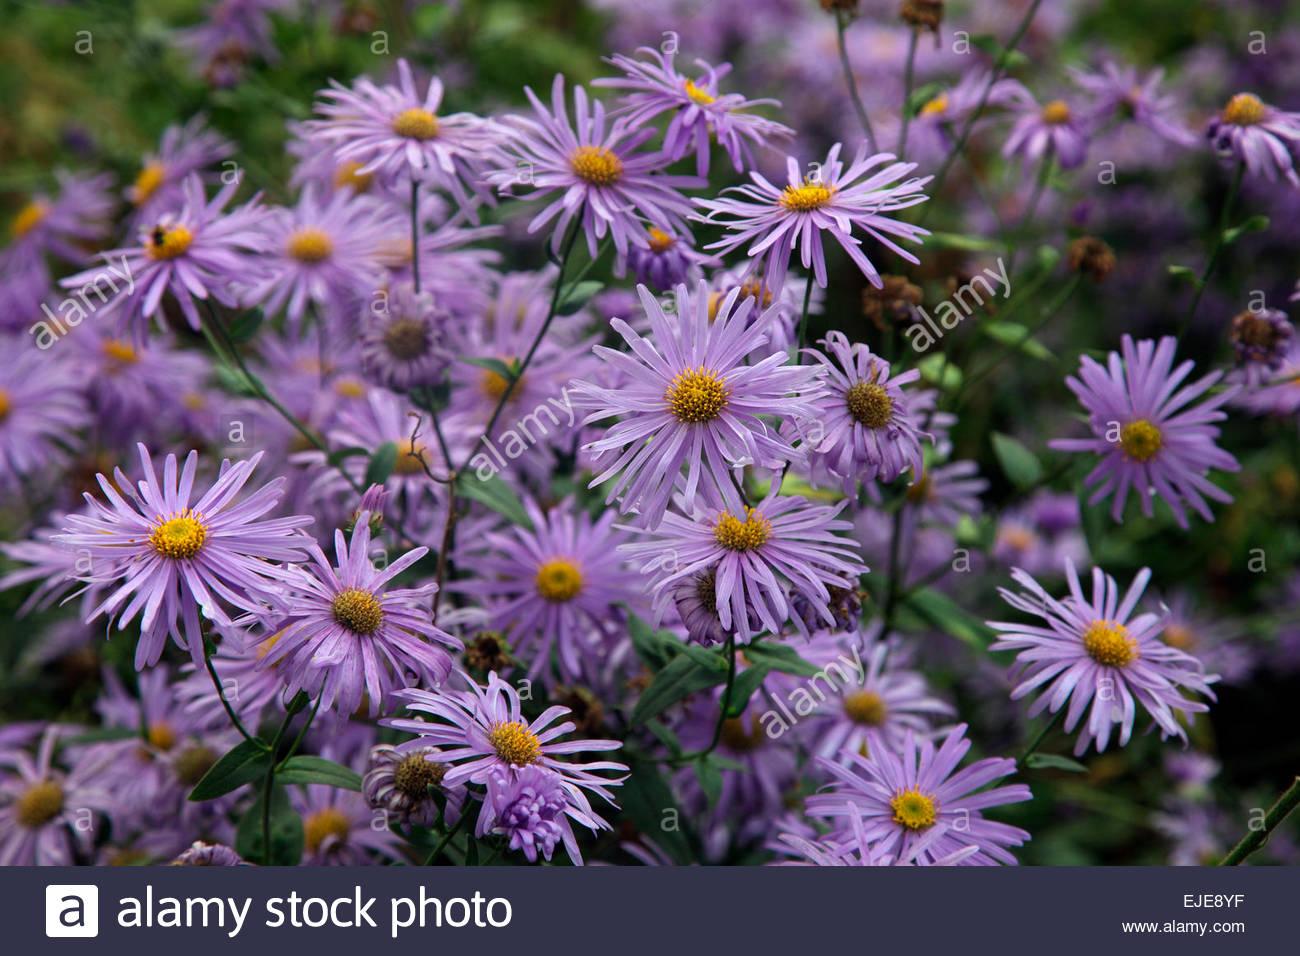 Herbaceous Perennial Plant September Autumn Late Daisy Flower Mauve